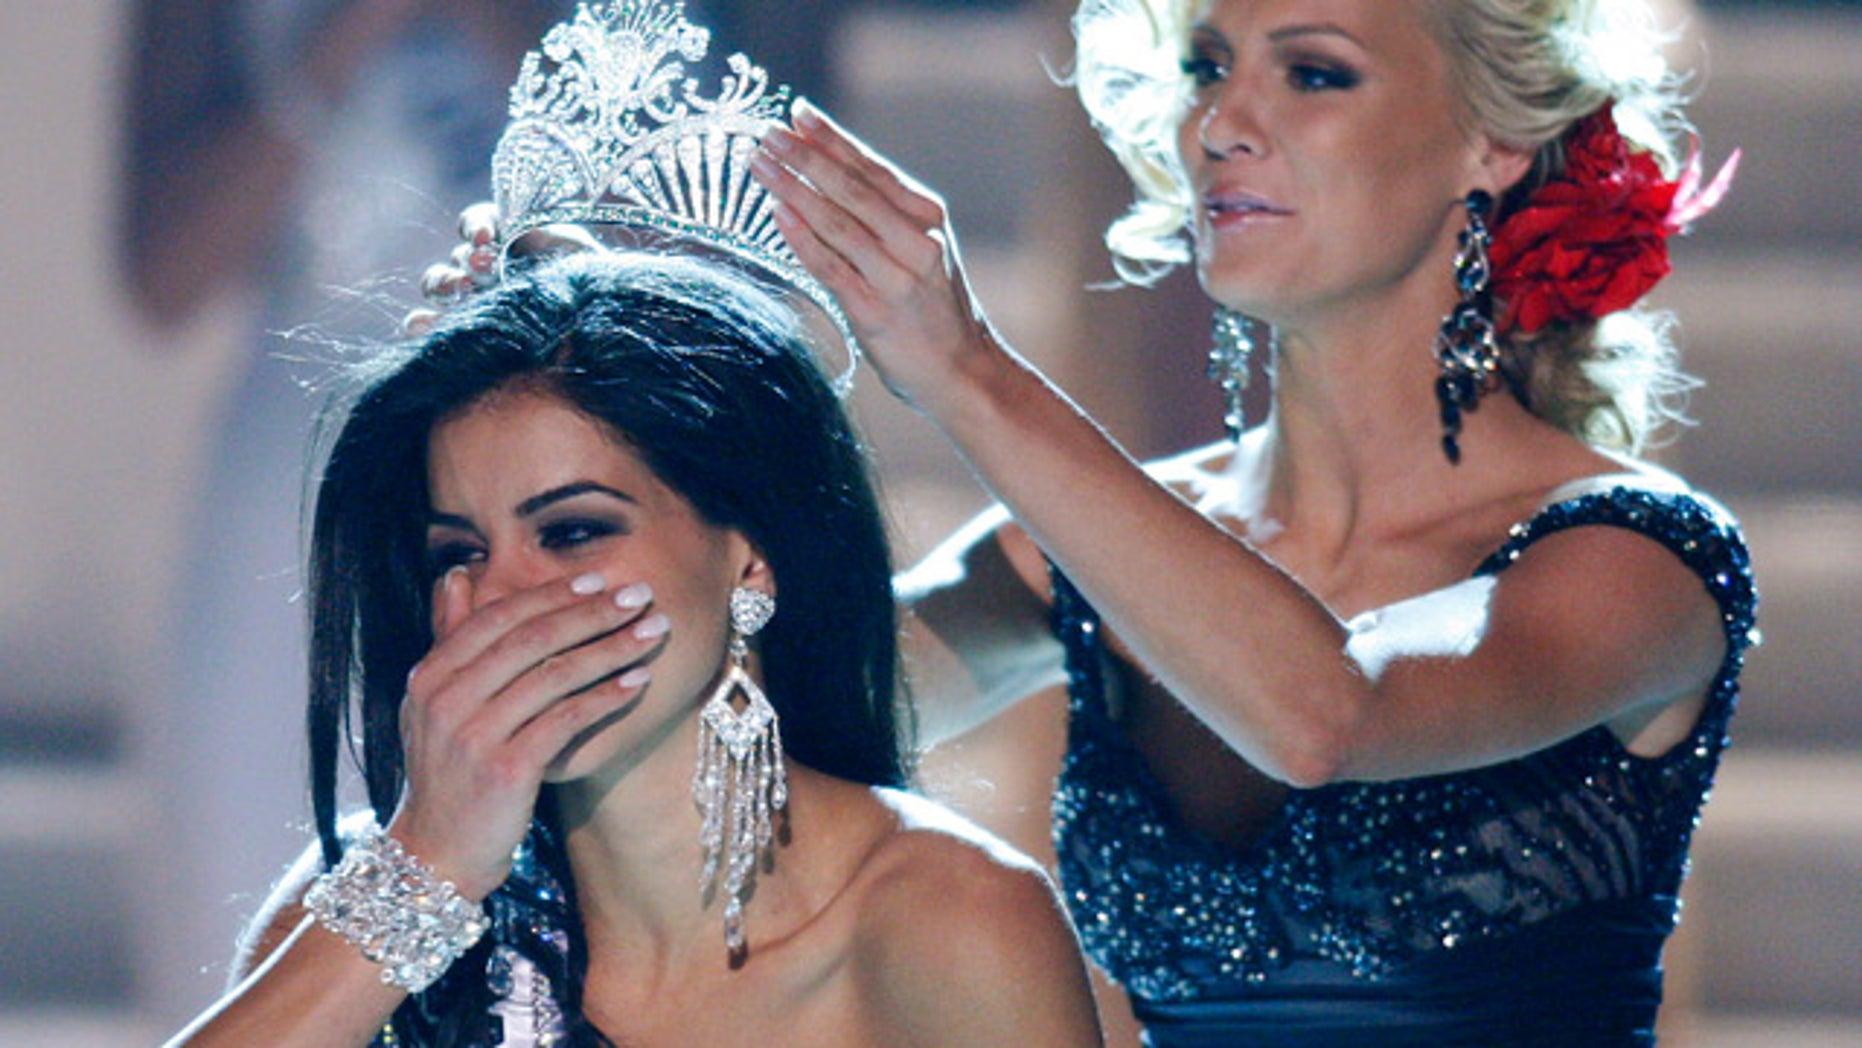 May 16: Miss Michigan Rima Fakih is crowned Miss USA 2010 by Kristen Dalton, Miss USA 2009.